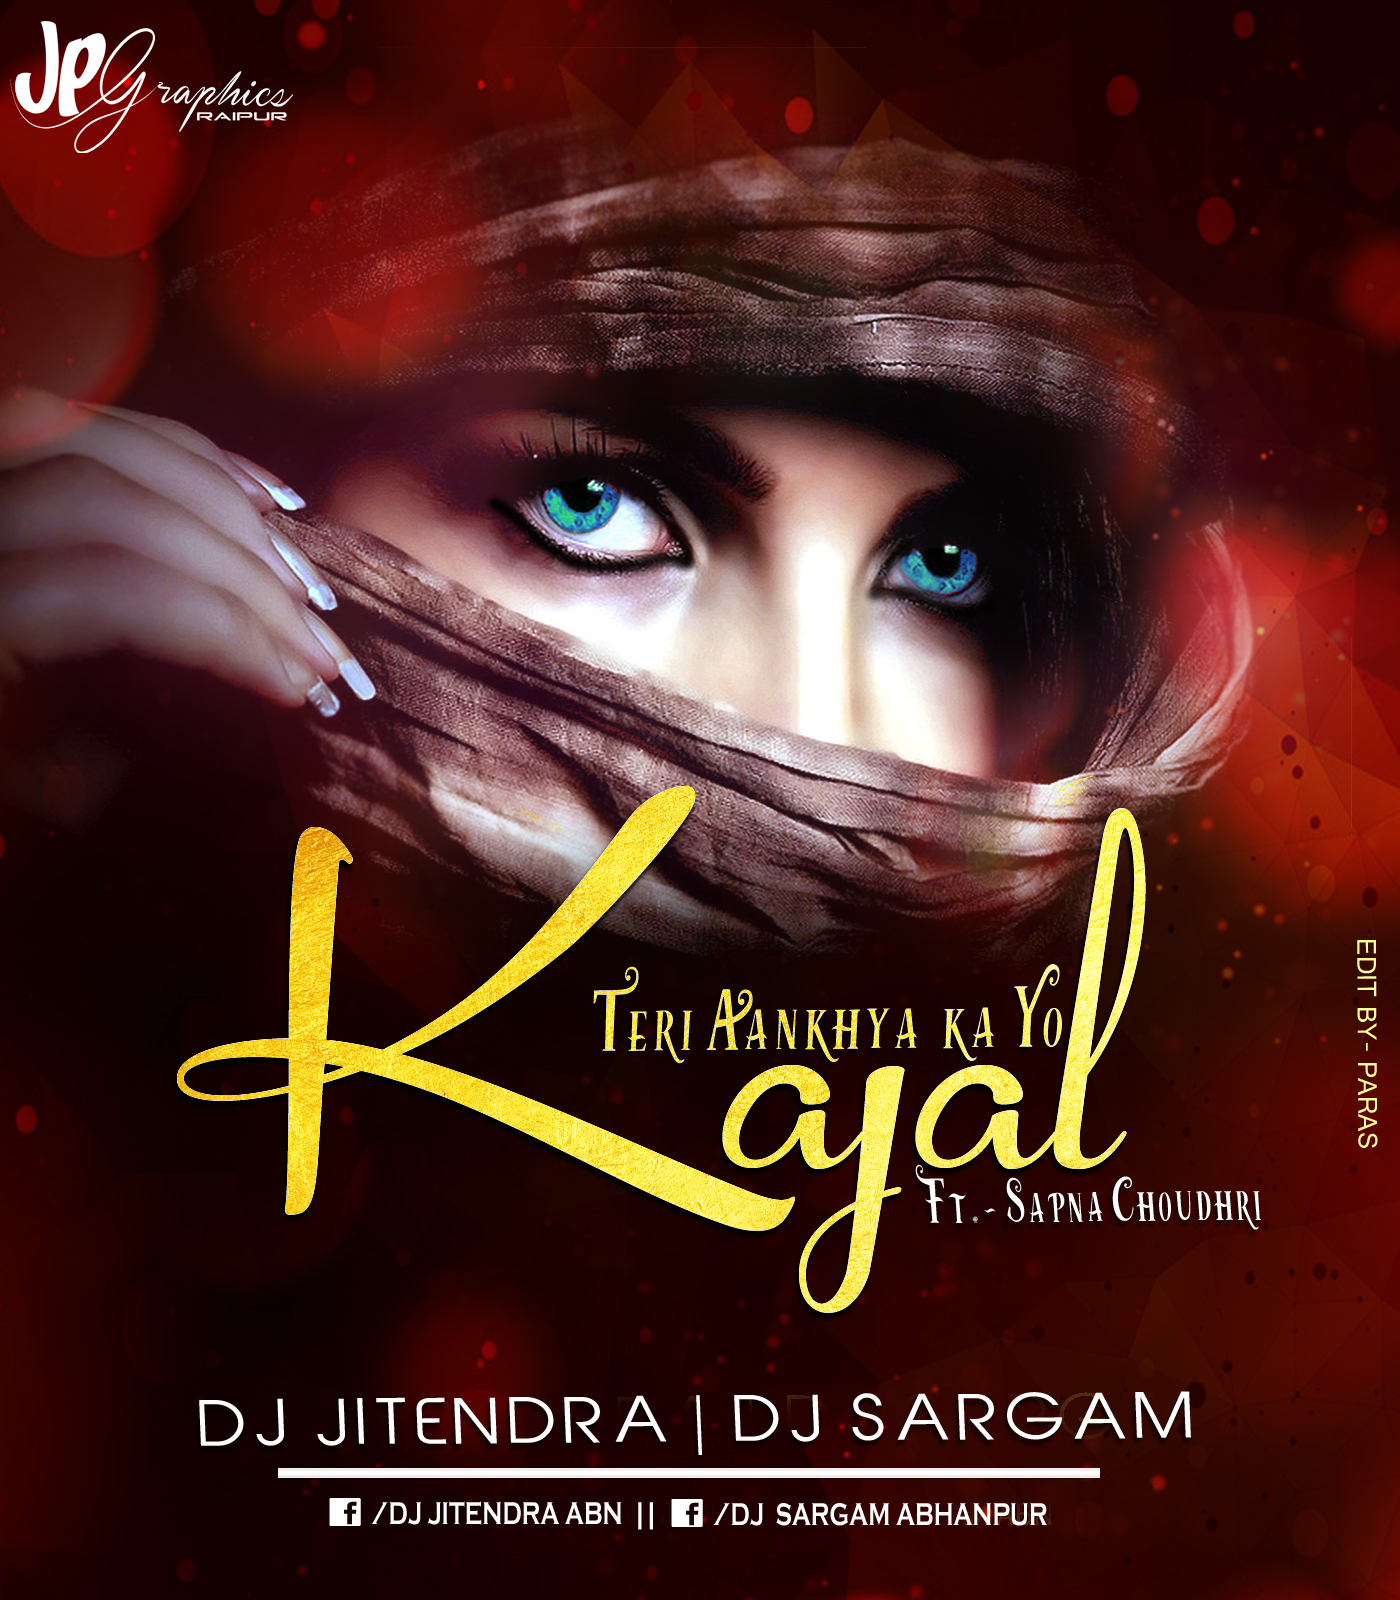 Teri Akhiyan Ka Kajal Download 2: DJ JITENDRA ÂBN